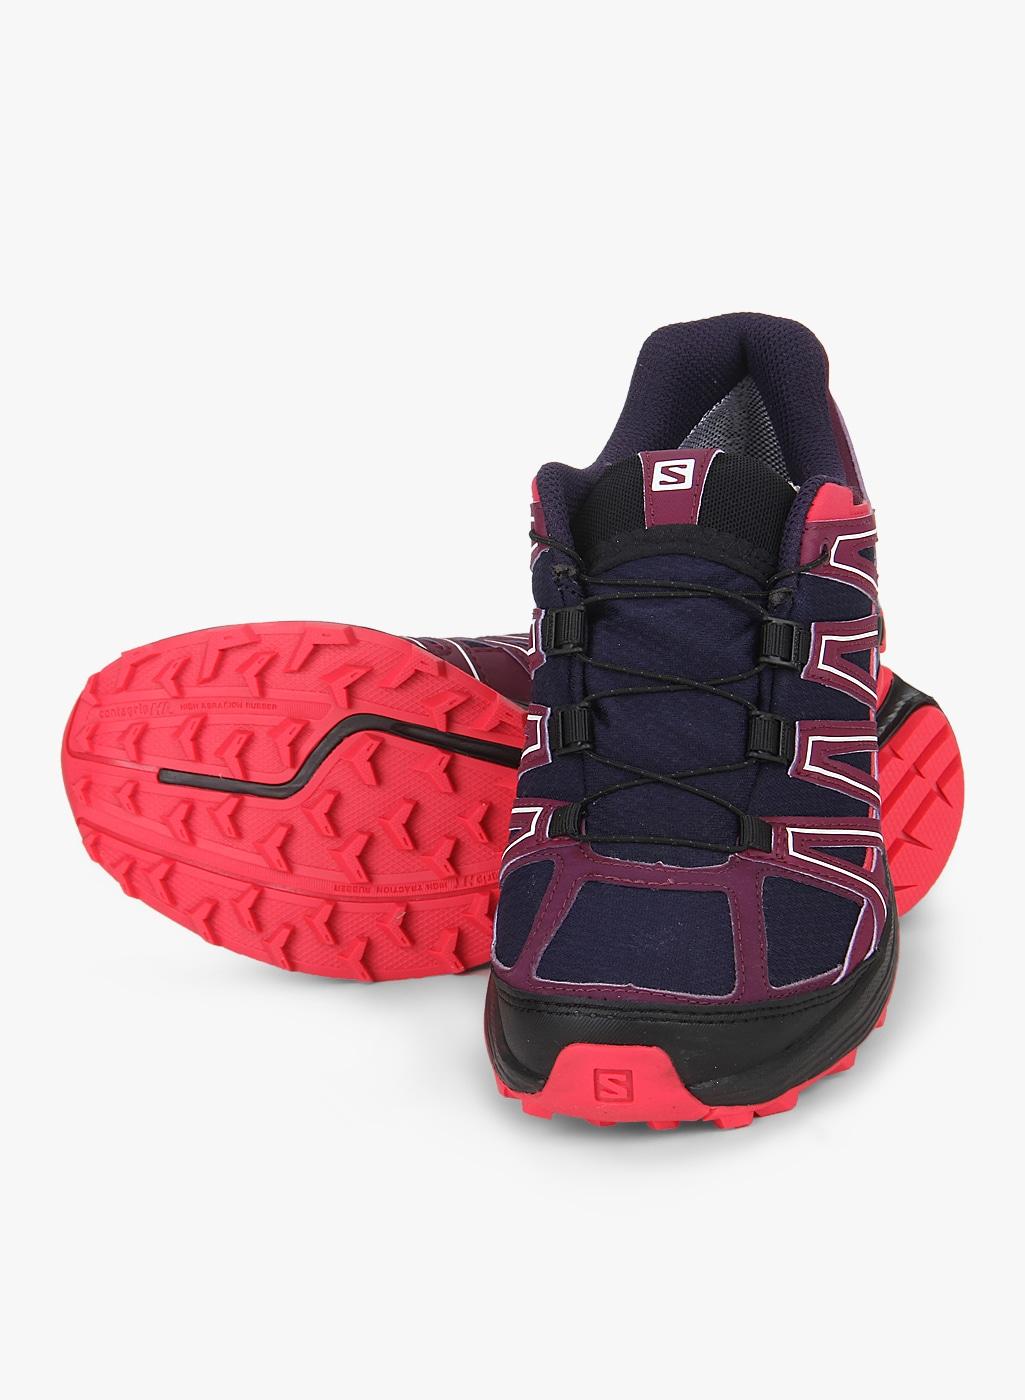 Salomon Xt Asama Gtx Navy Blue Running Shoes for Women's